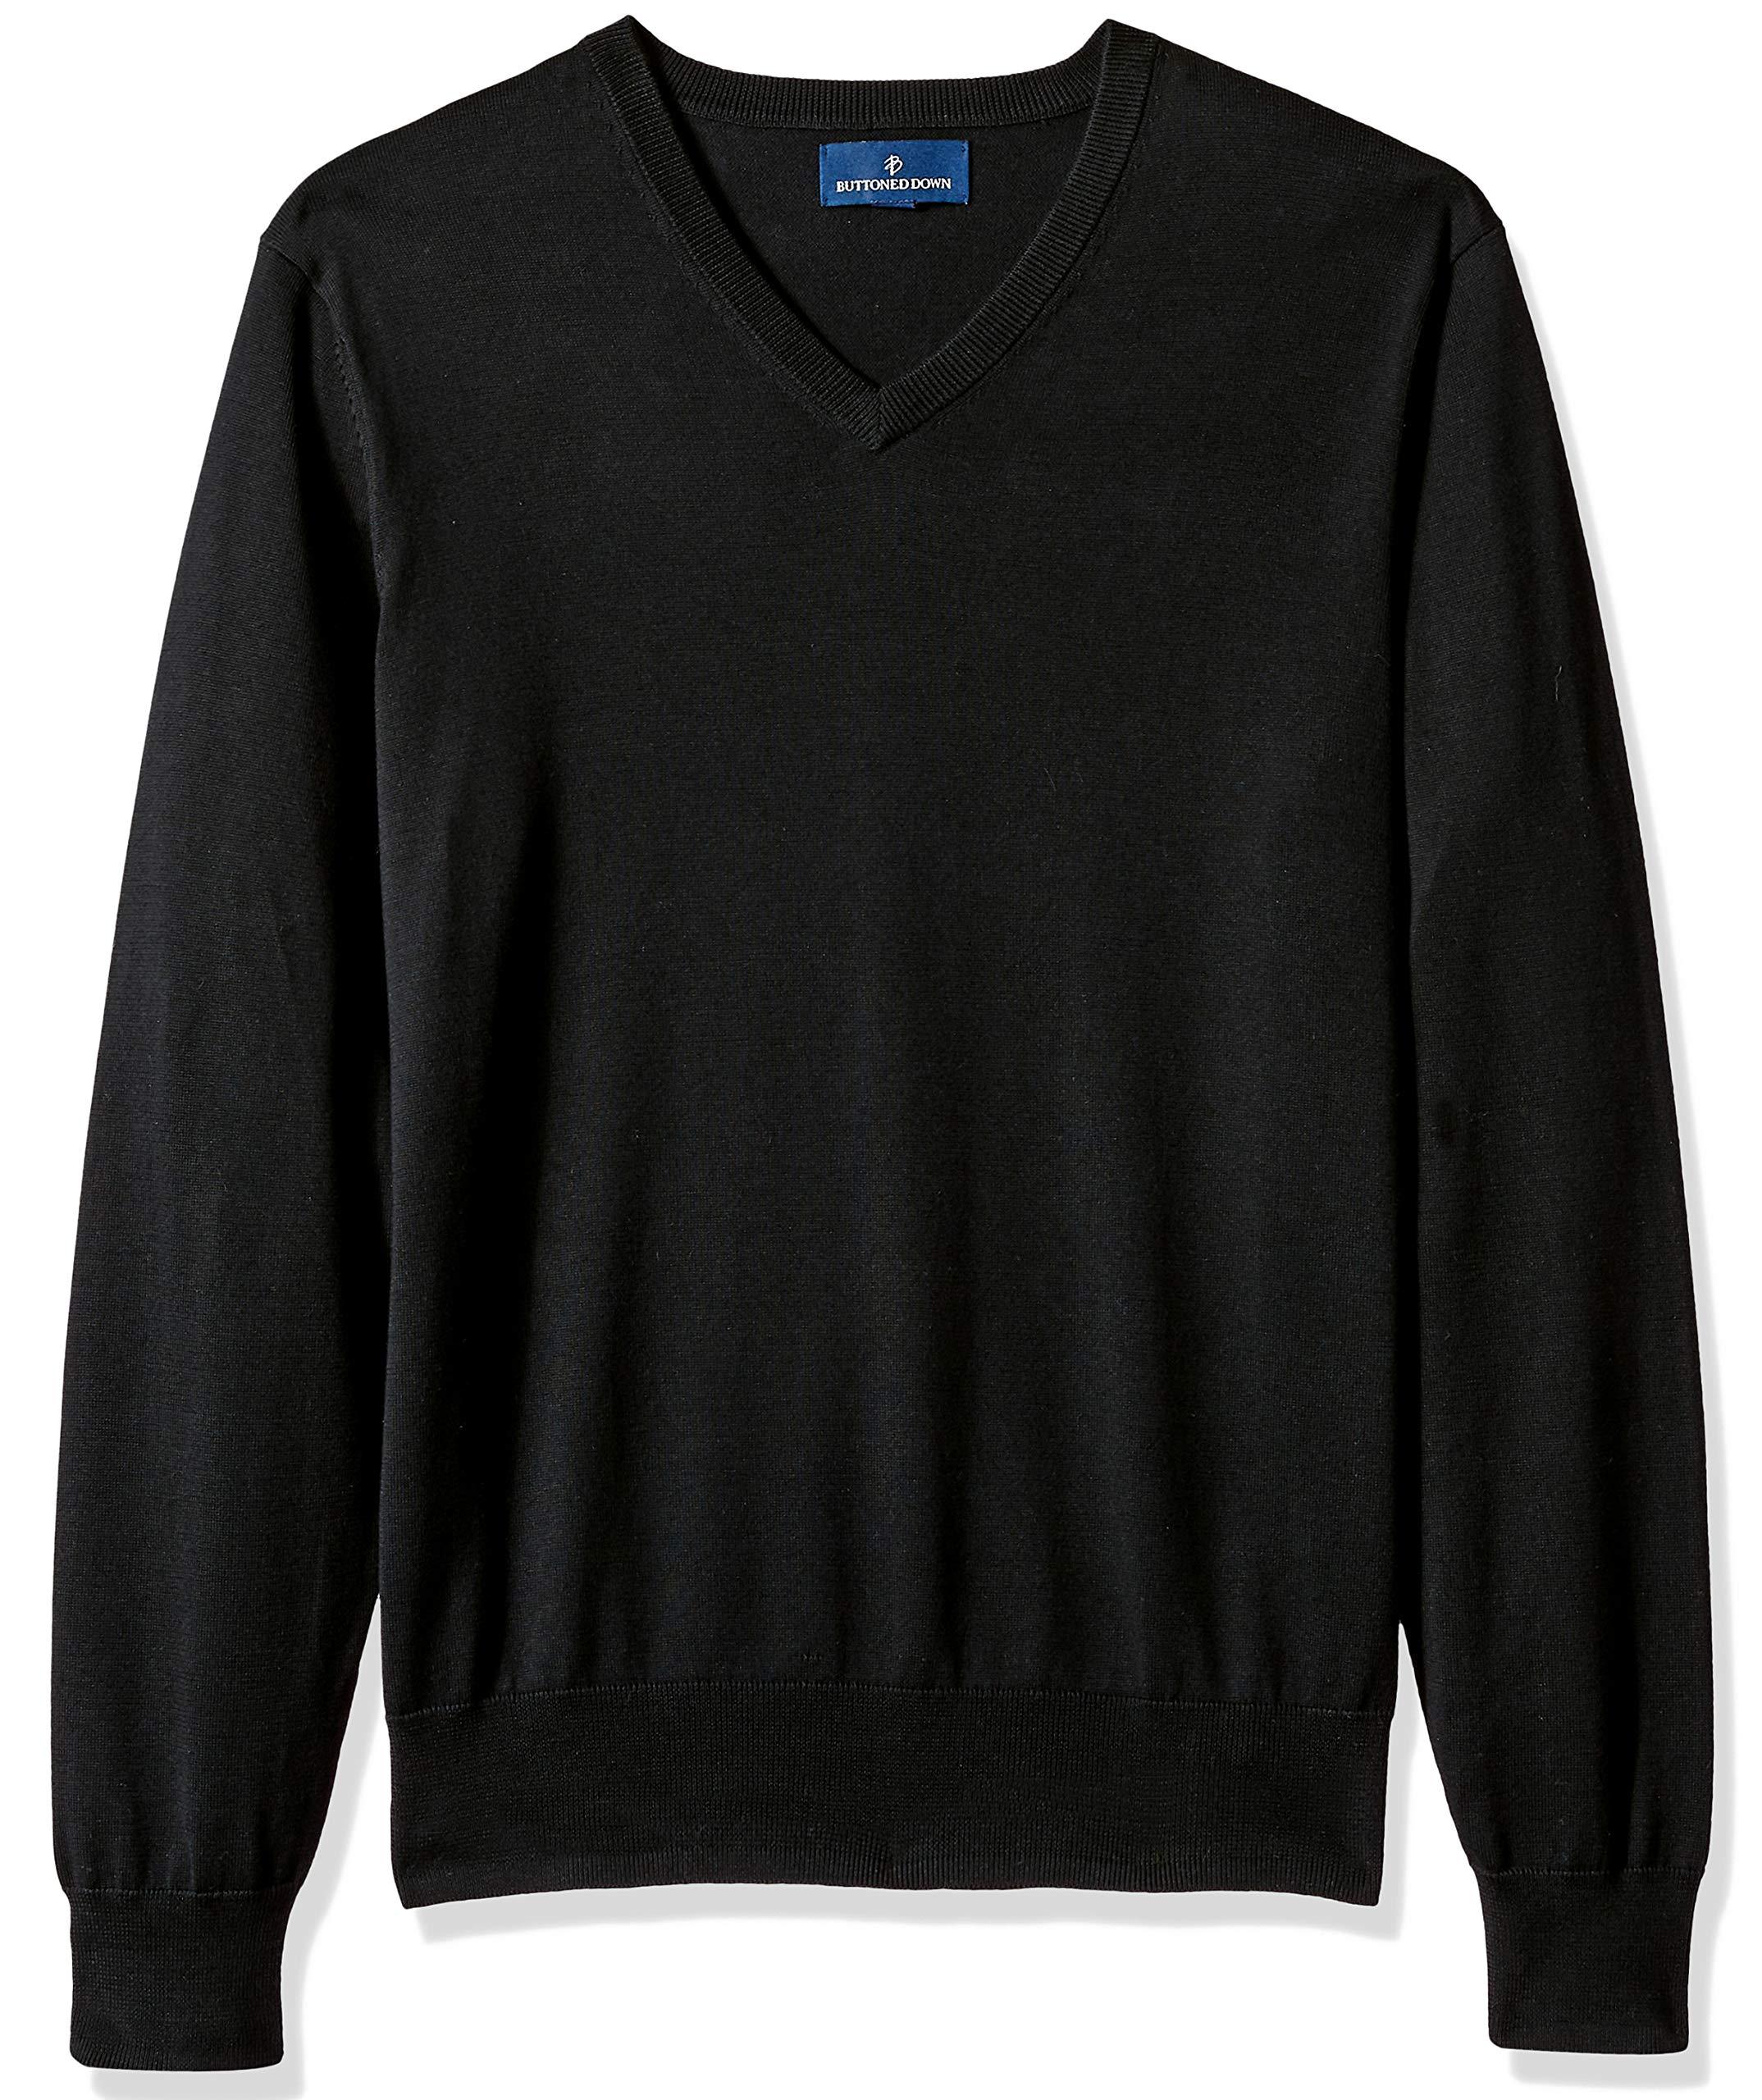 BUTTONED DOWN Men's Supima Cotton Lightweight V-Neck Sweater, black, XXX-Large